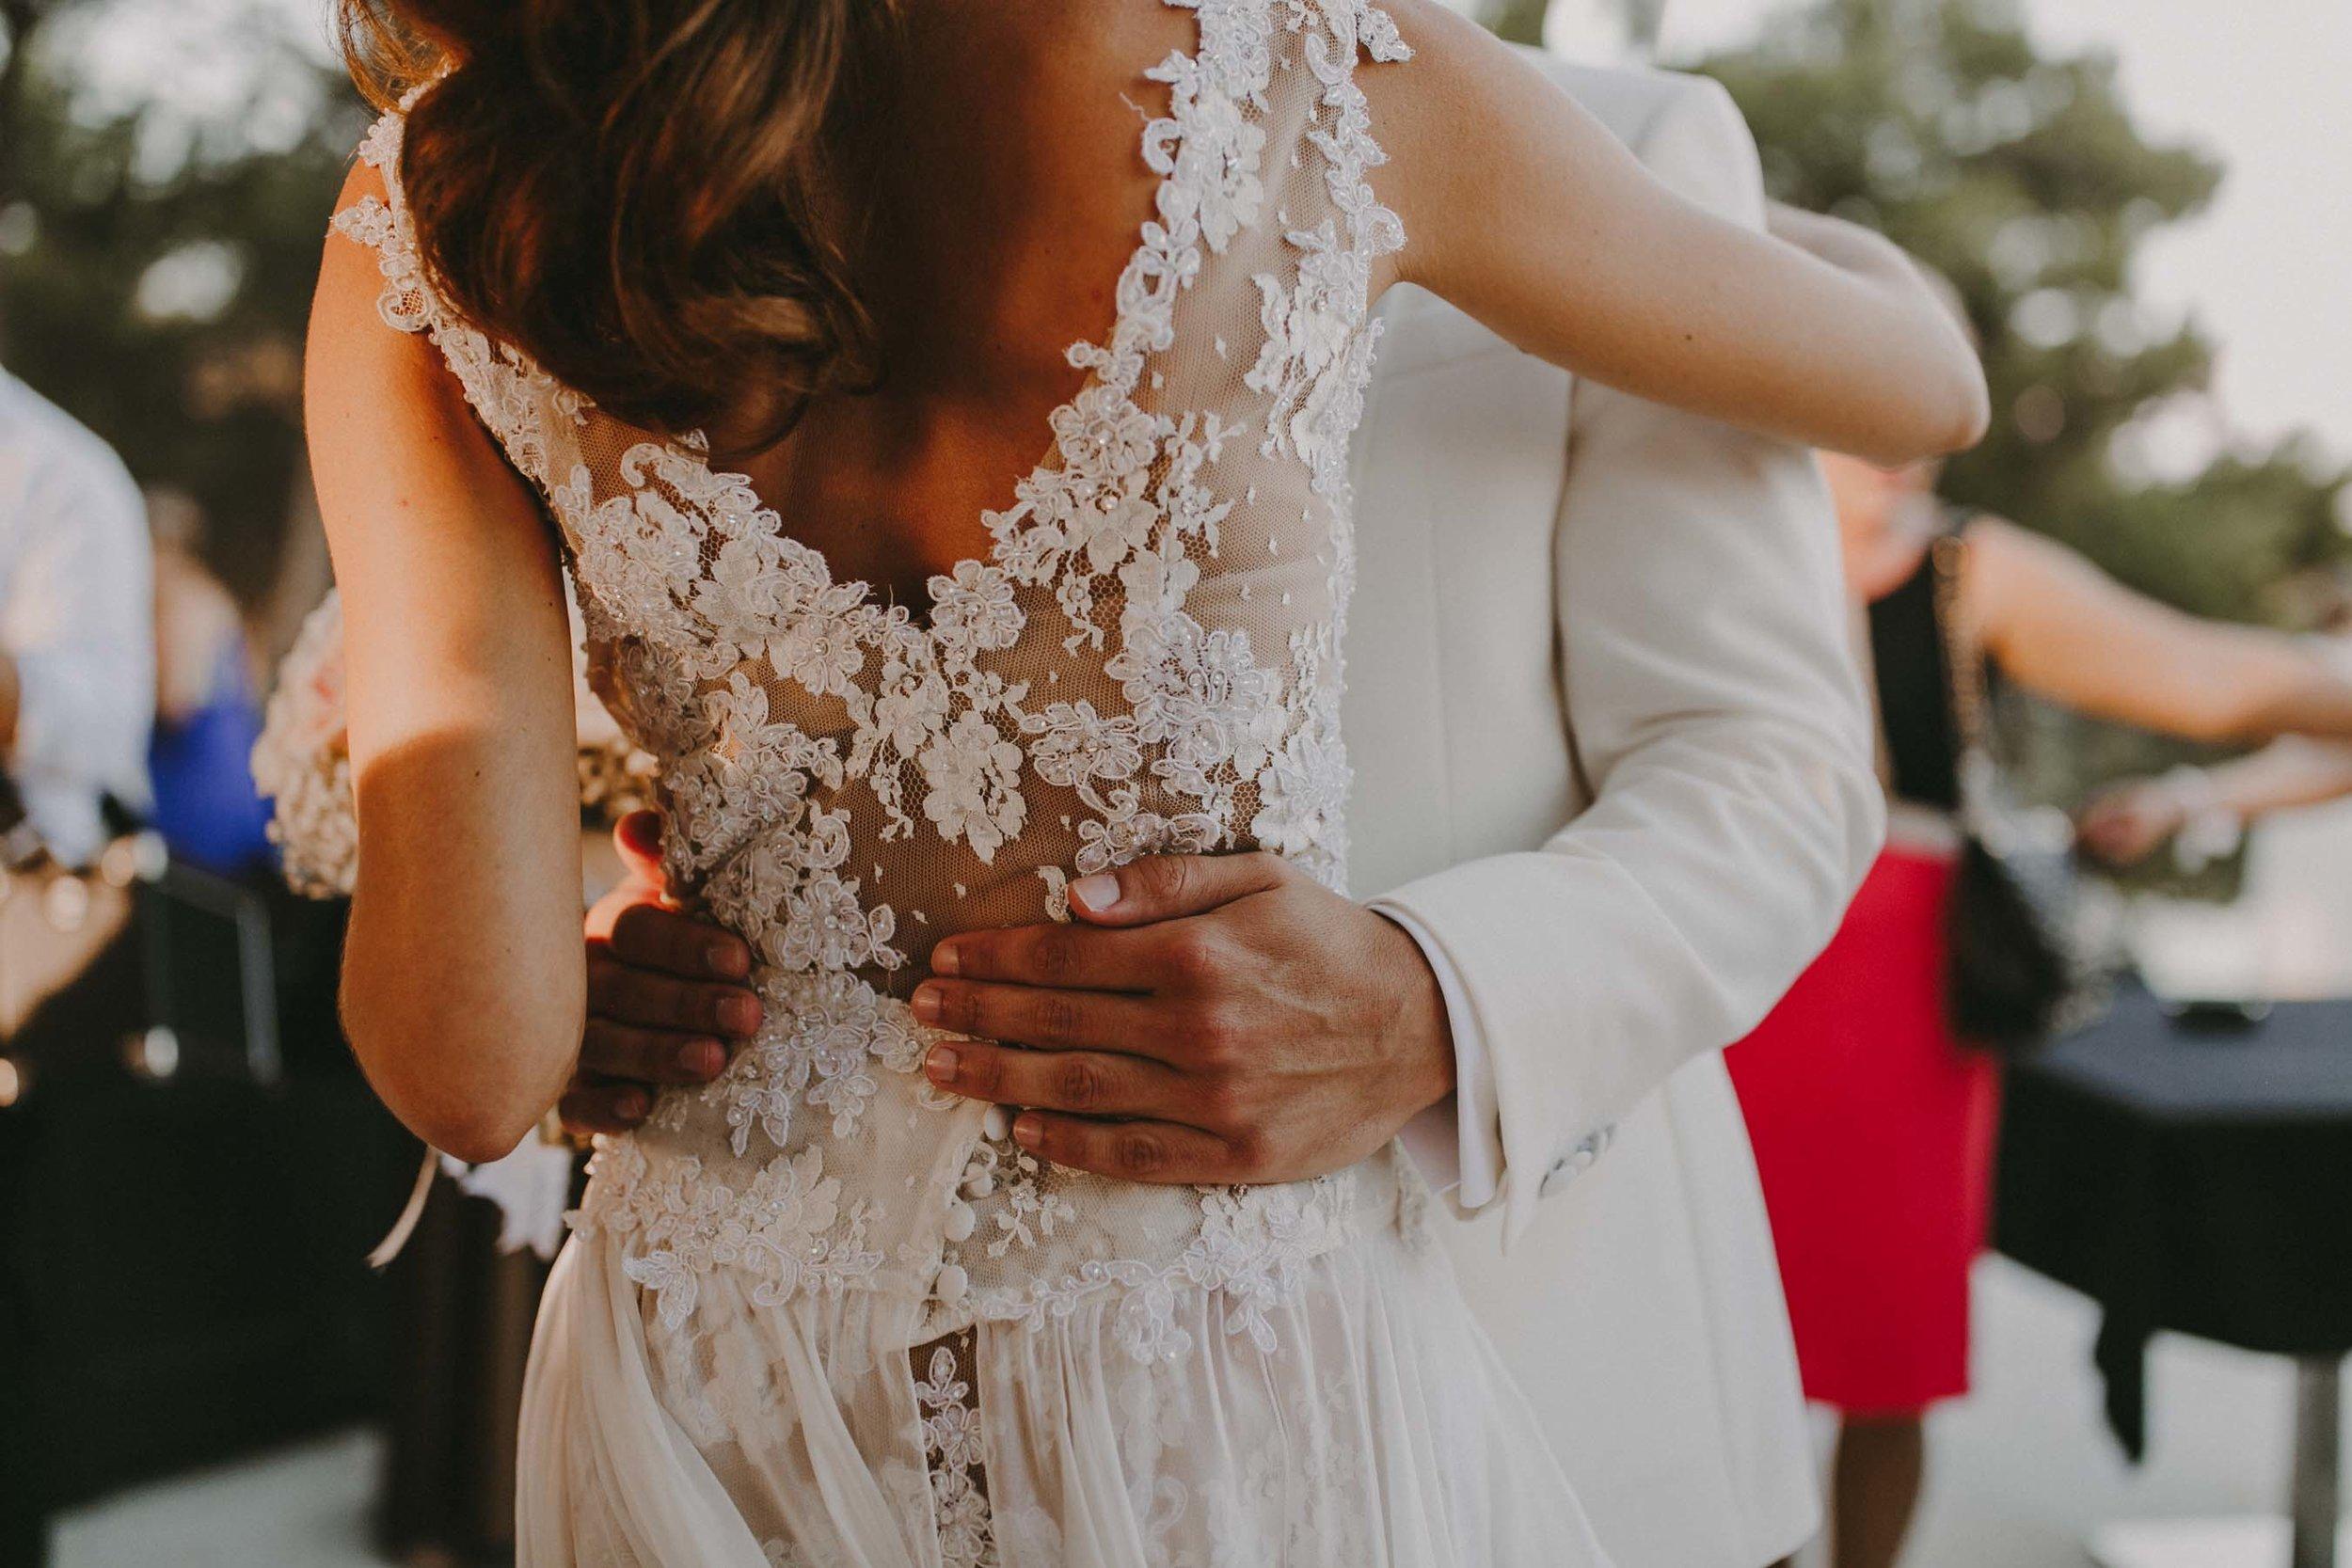 sylvia&dimitri-Wedding-Crvena_Luka-Croatia-53(7922).jpg